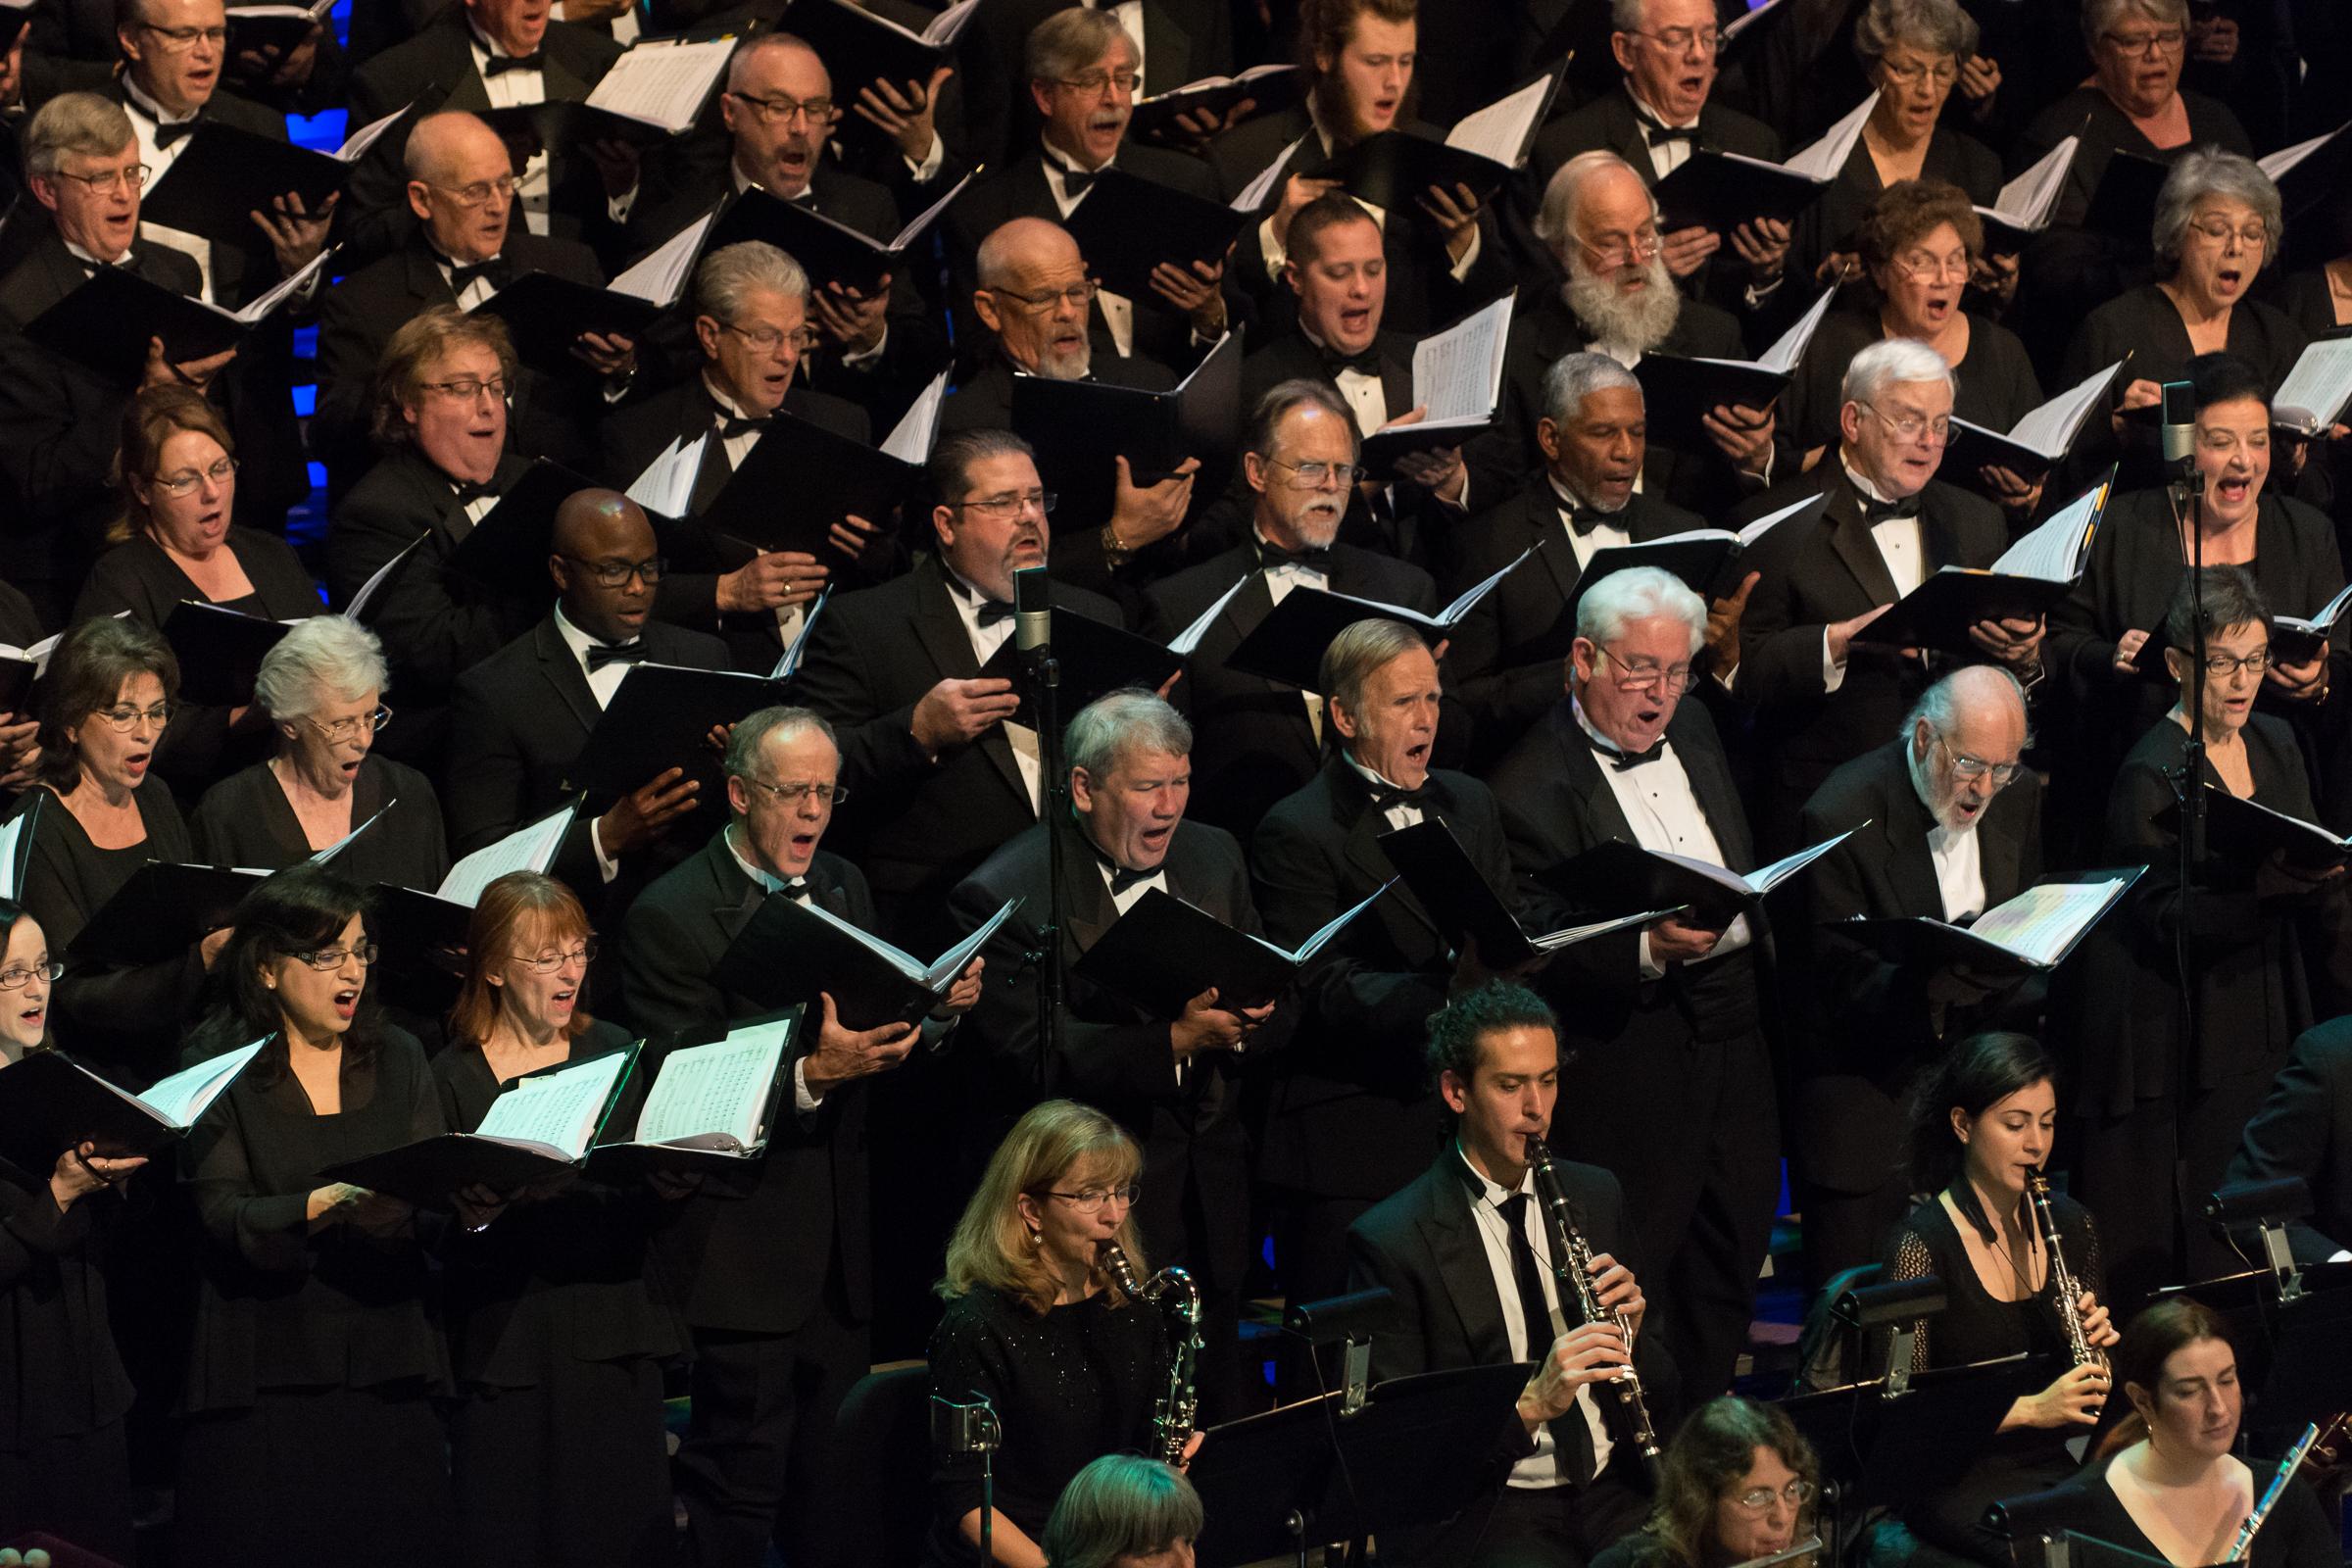 MSO Chorus